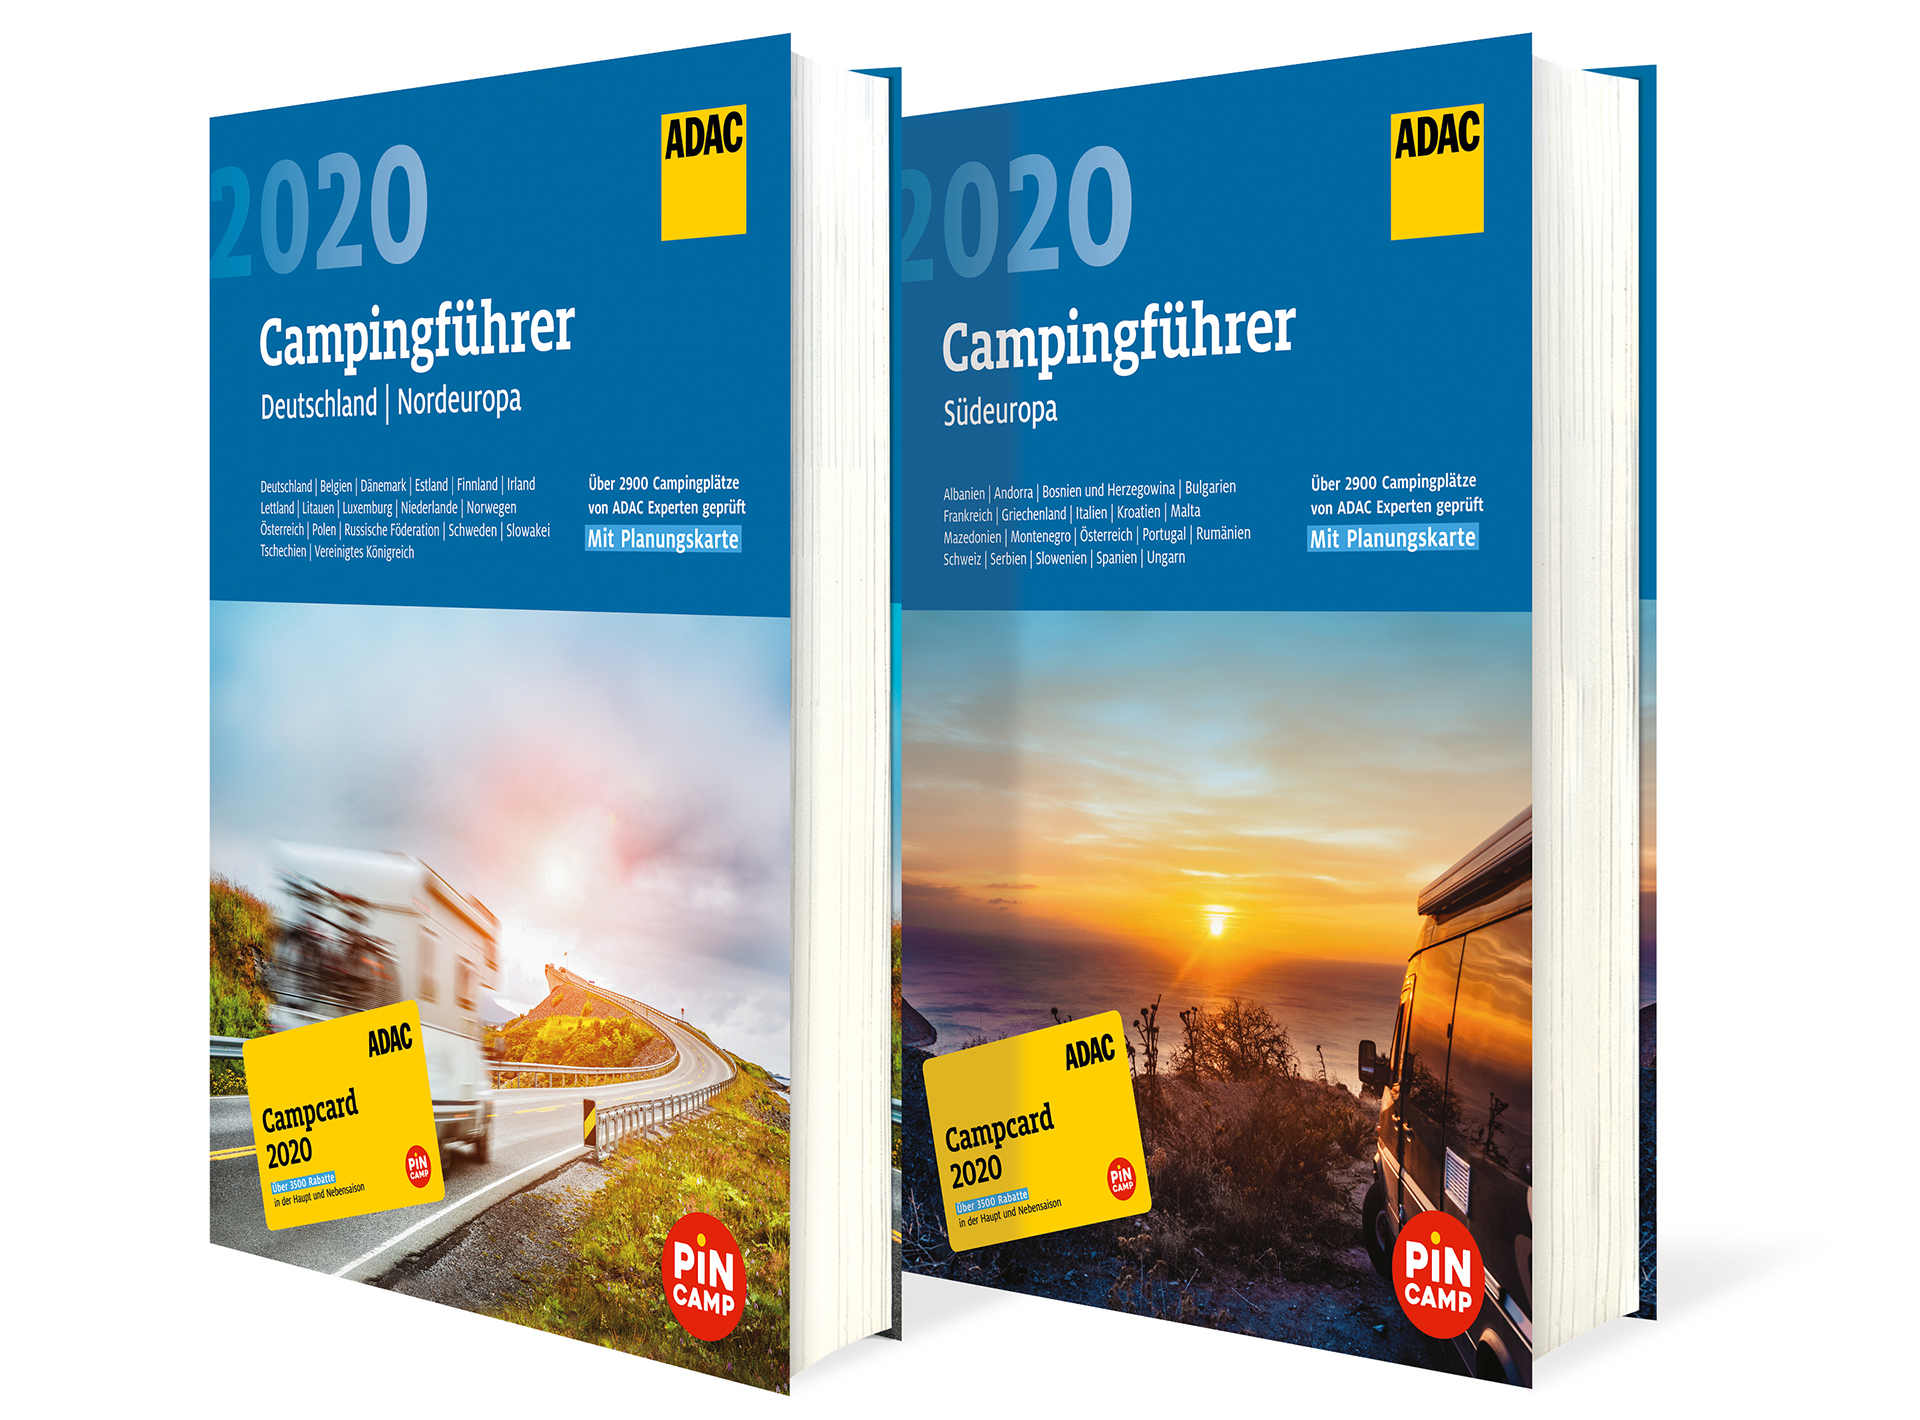 ADAC Campingführer 2020